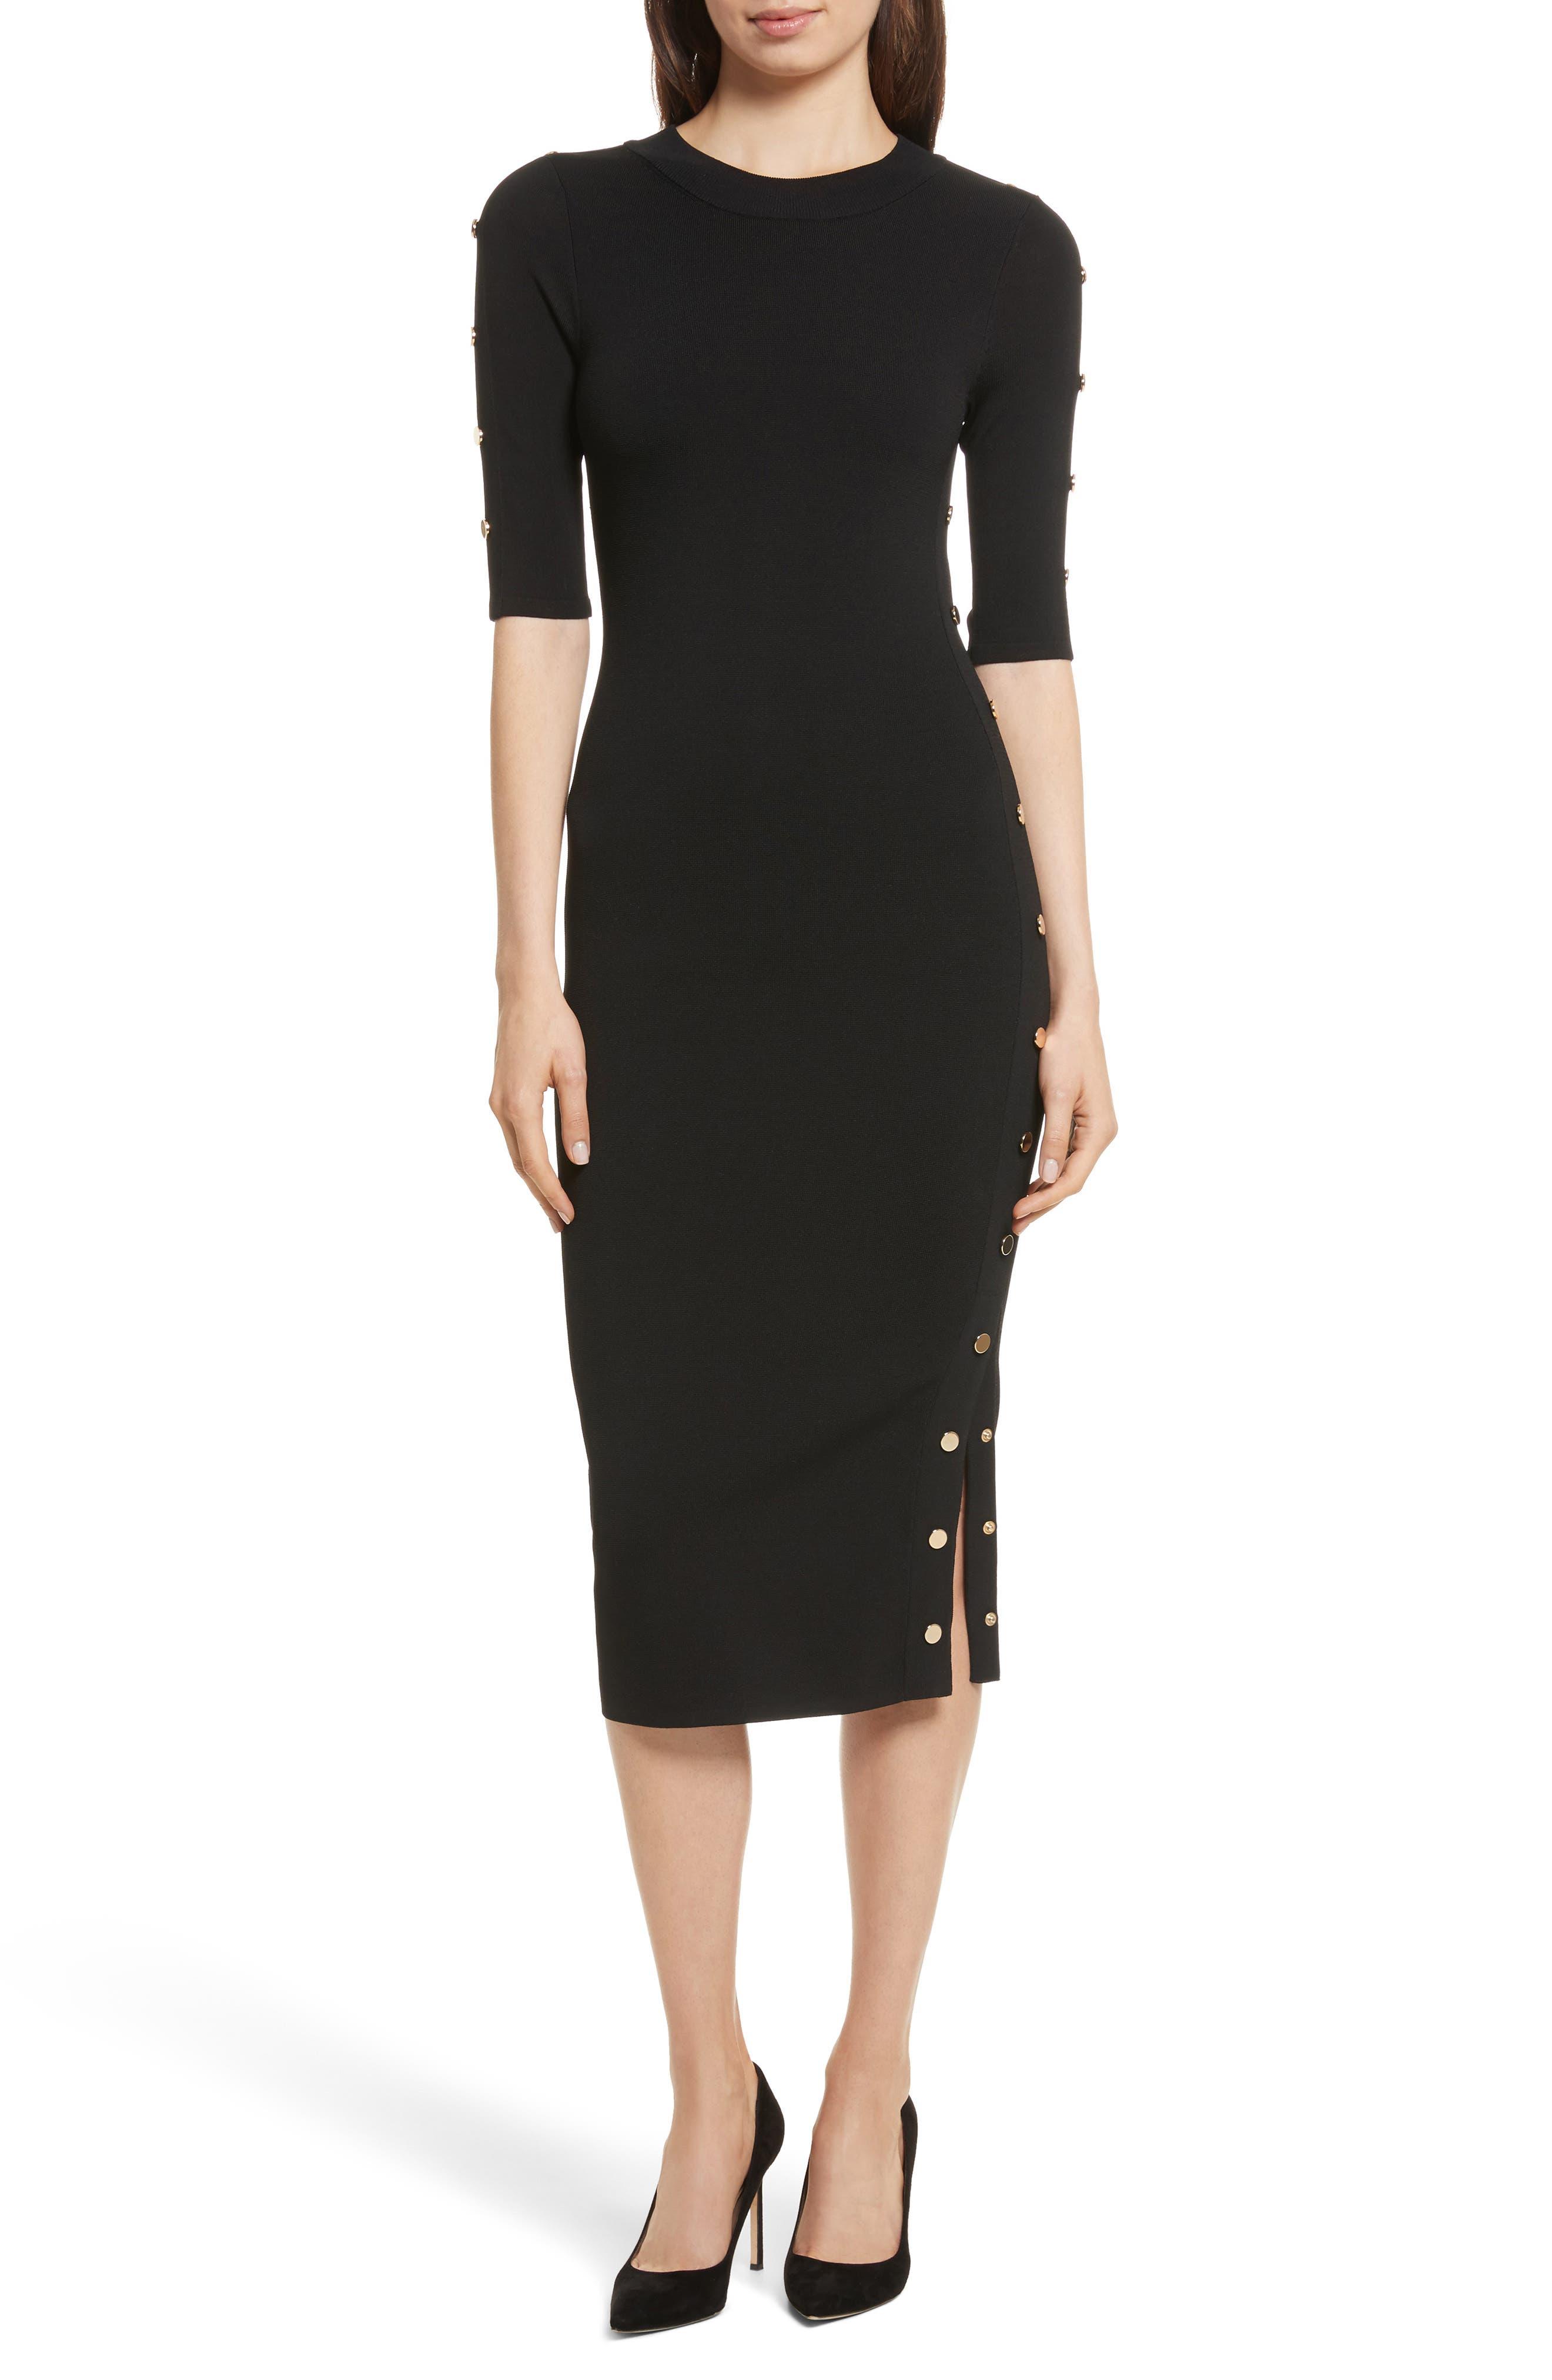 Veronica Beard Joss Body-Con Knit Dress